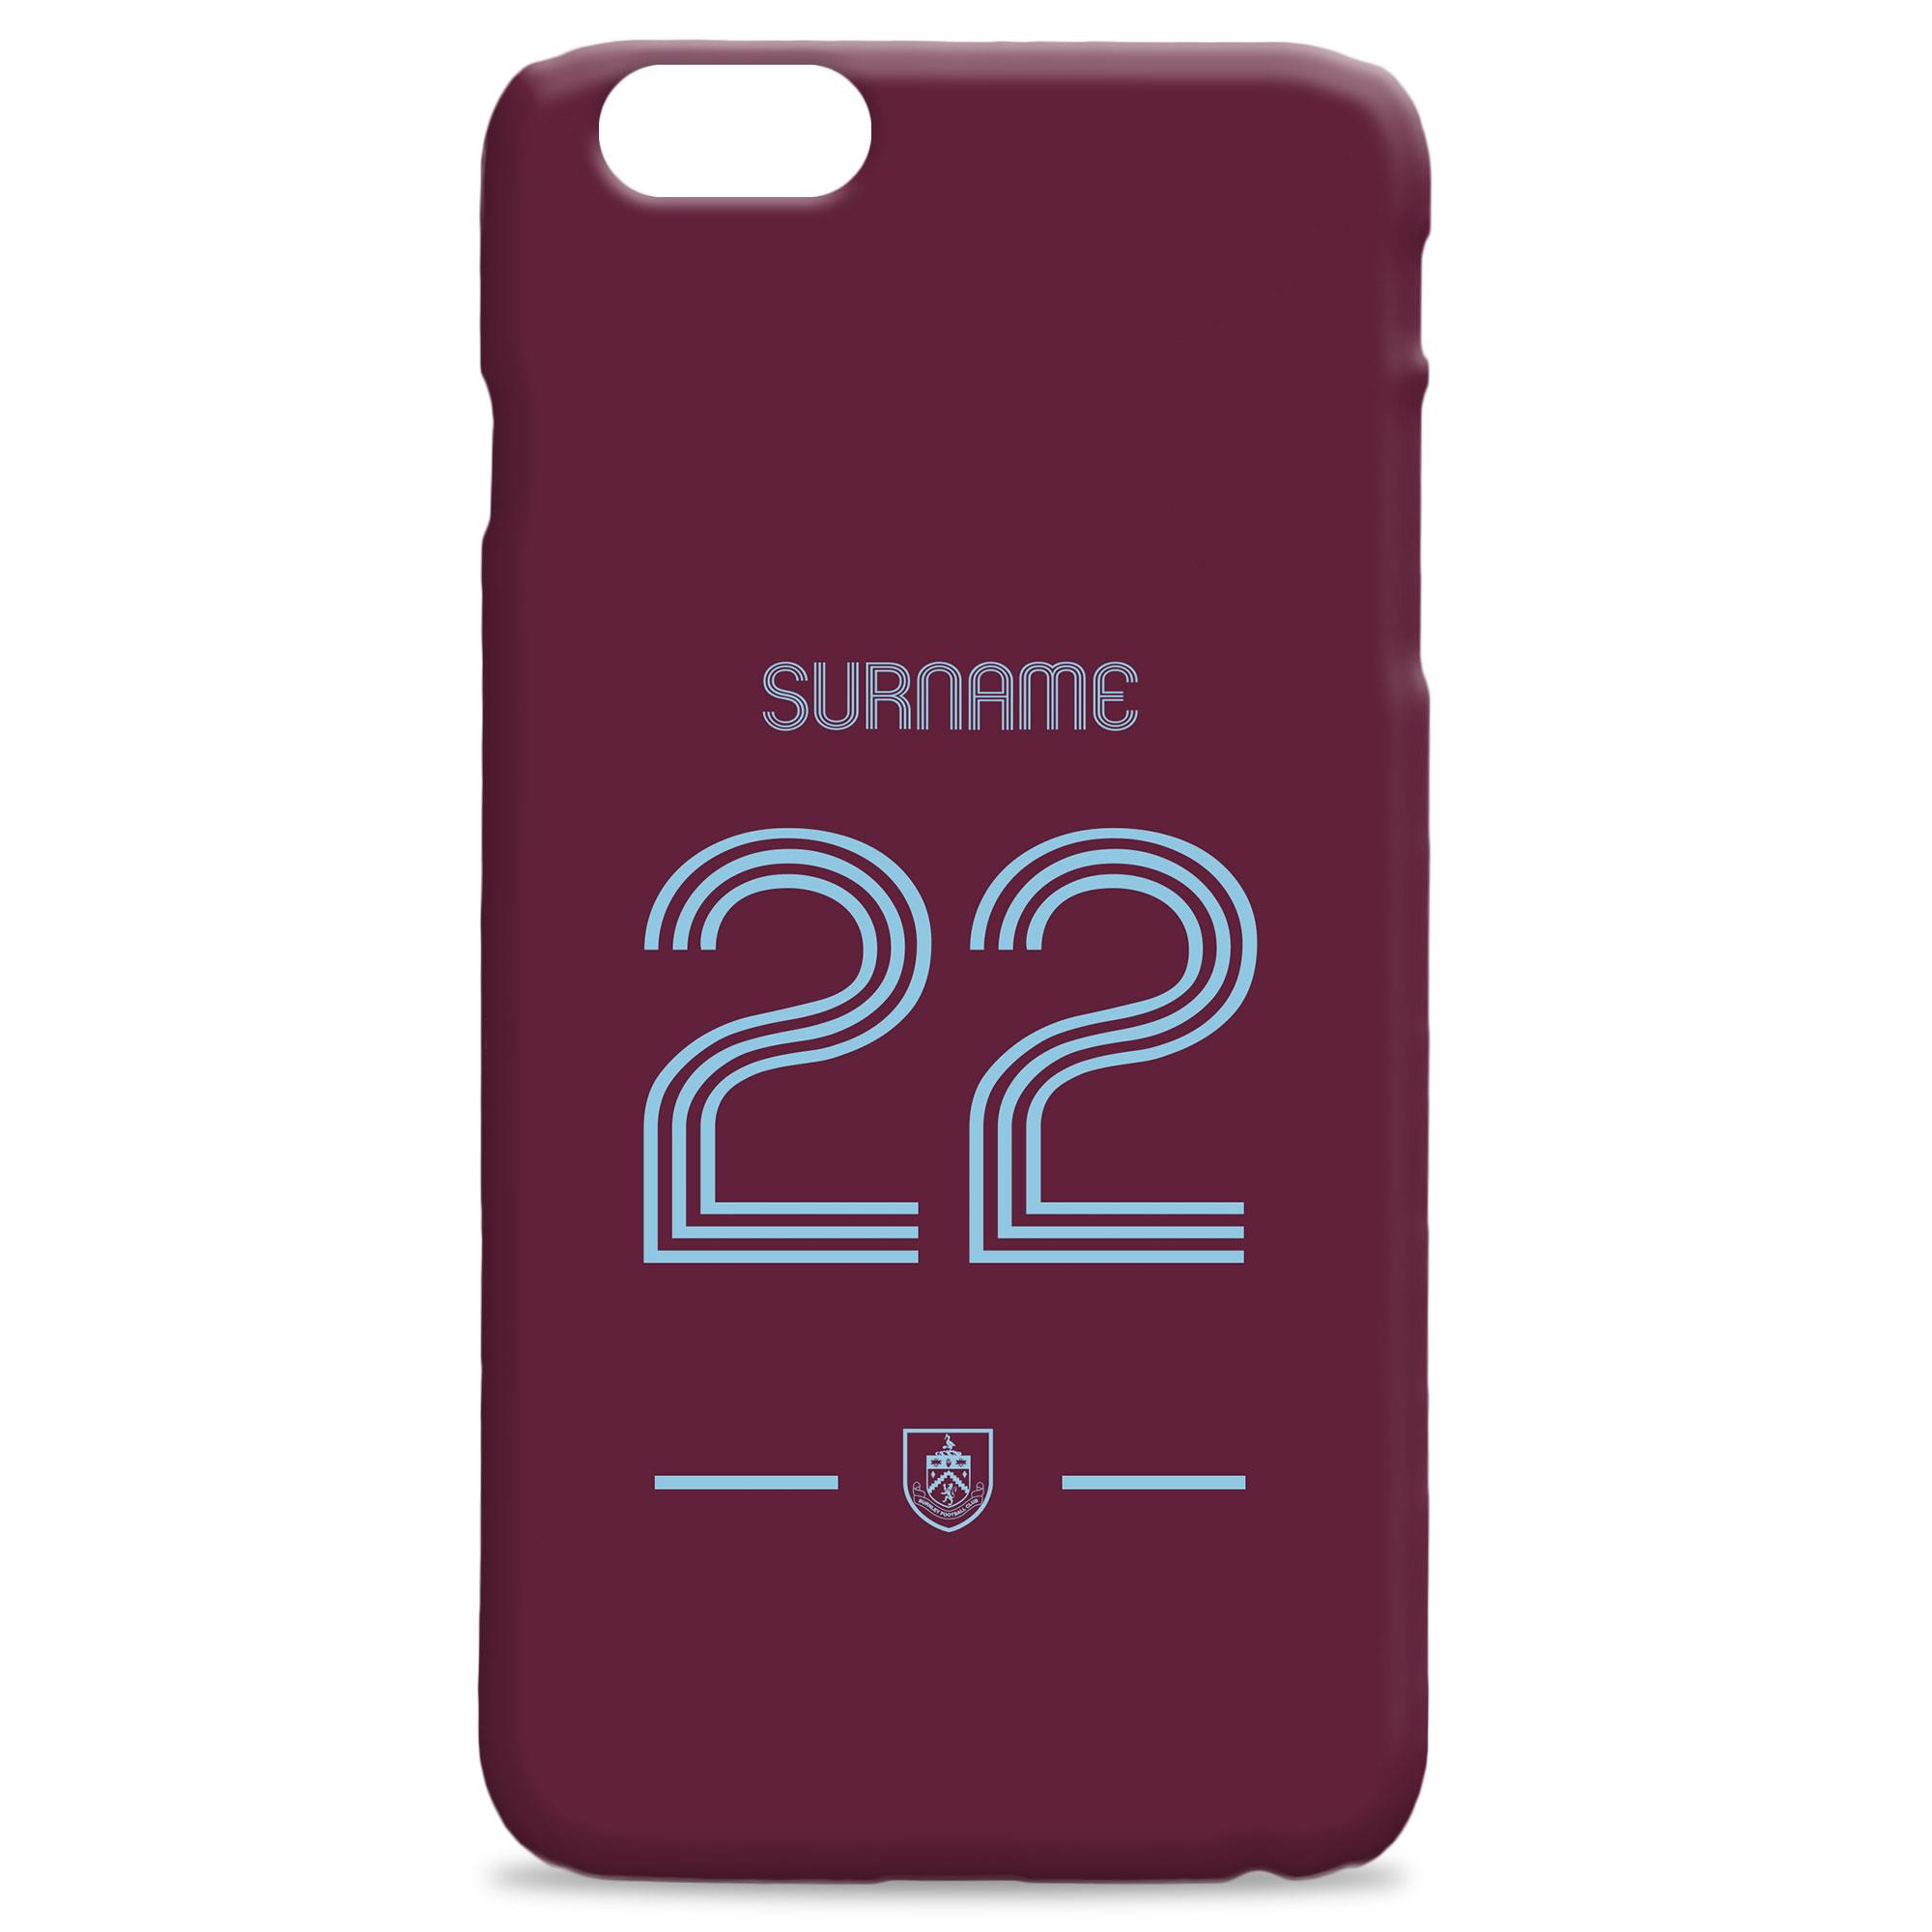 Burnley FC Retro Shirt Hard Back Phone Case